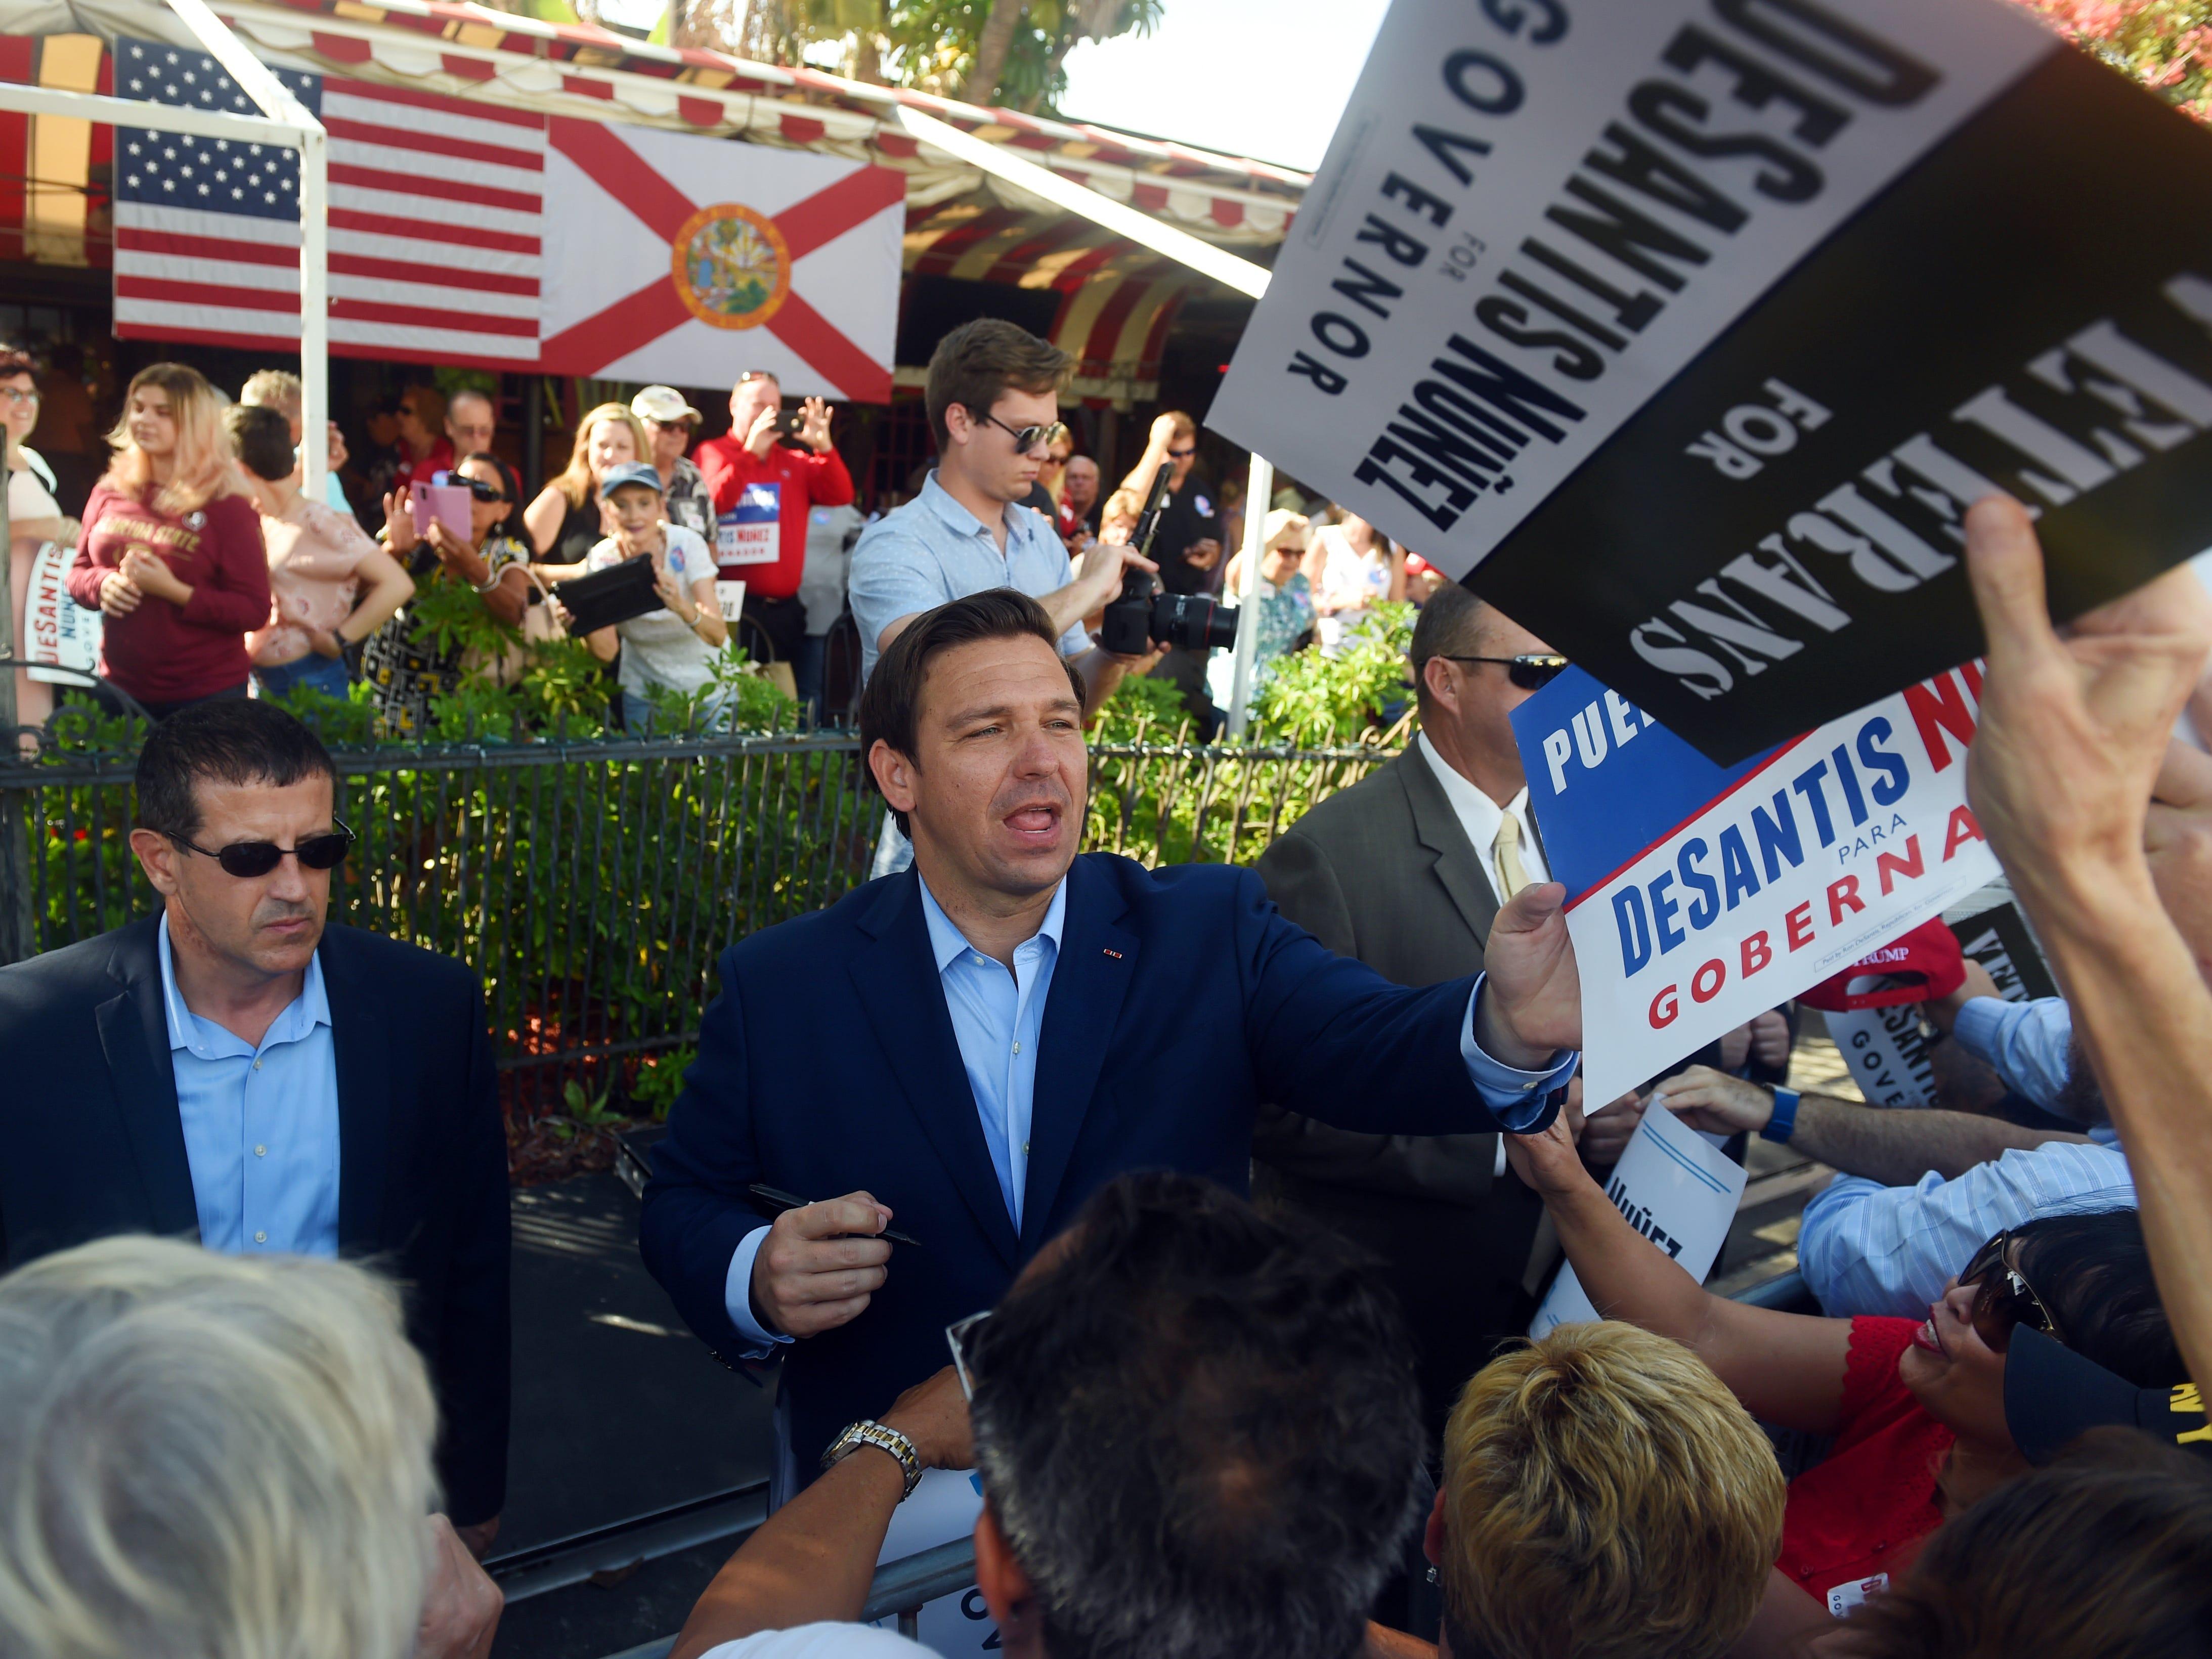 Florida Governor-elect Ron DeSantis plans 'Thank You' tour